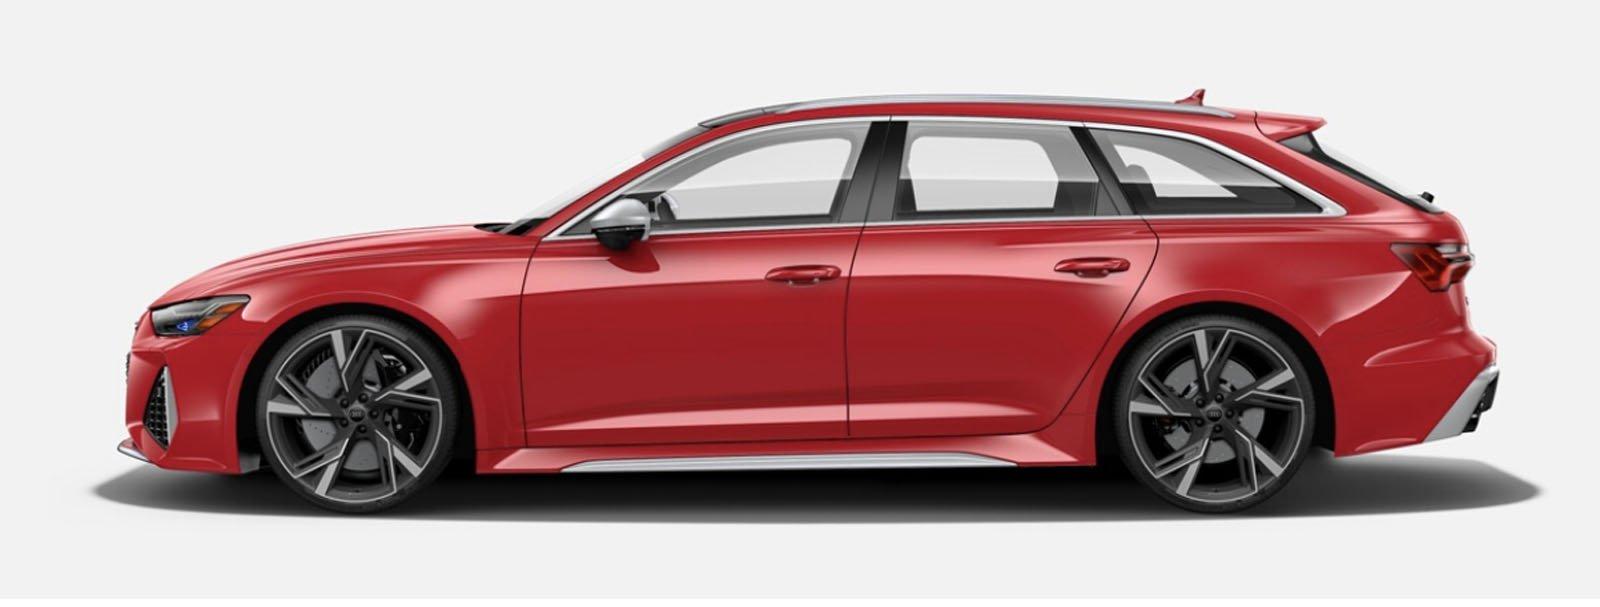 2021 Audi RS 6 Avant Tango Red